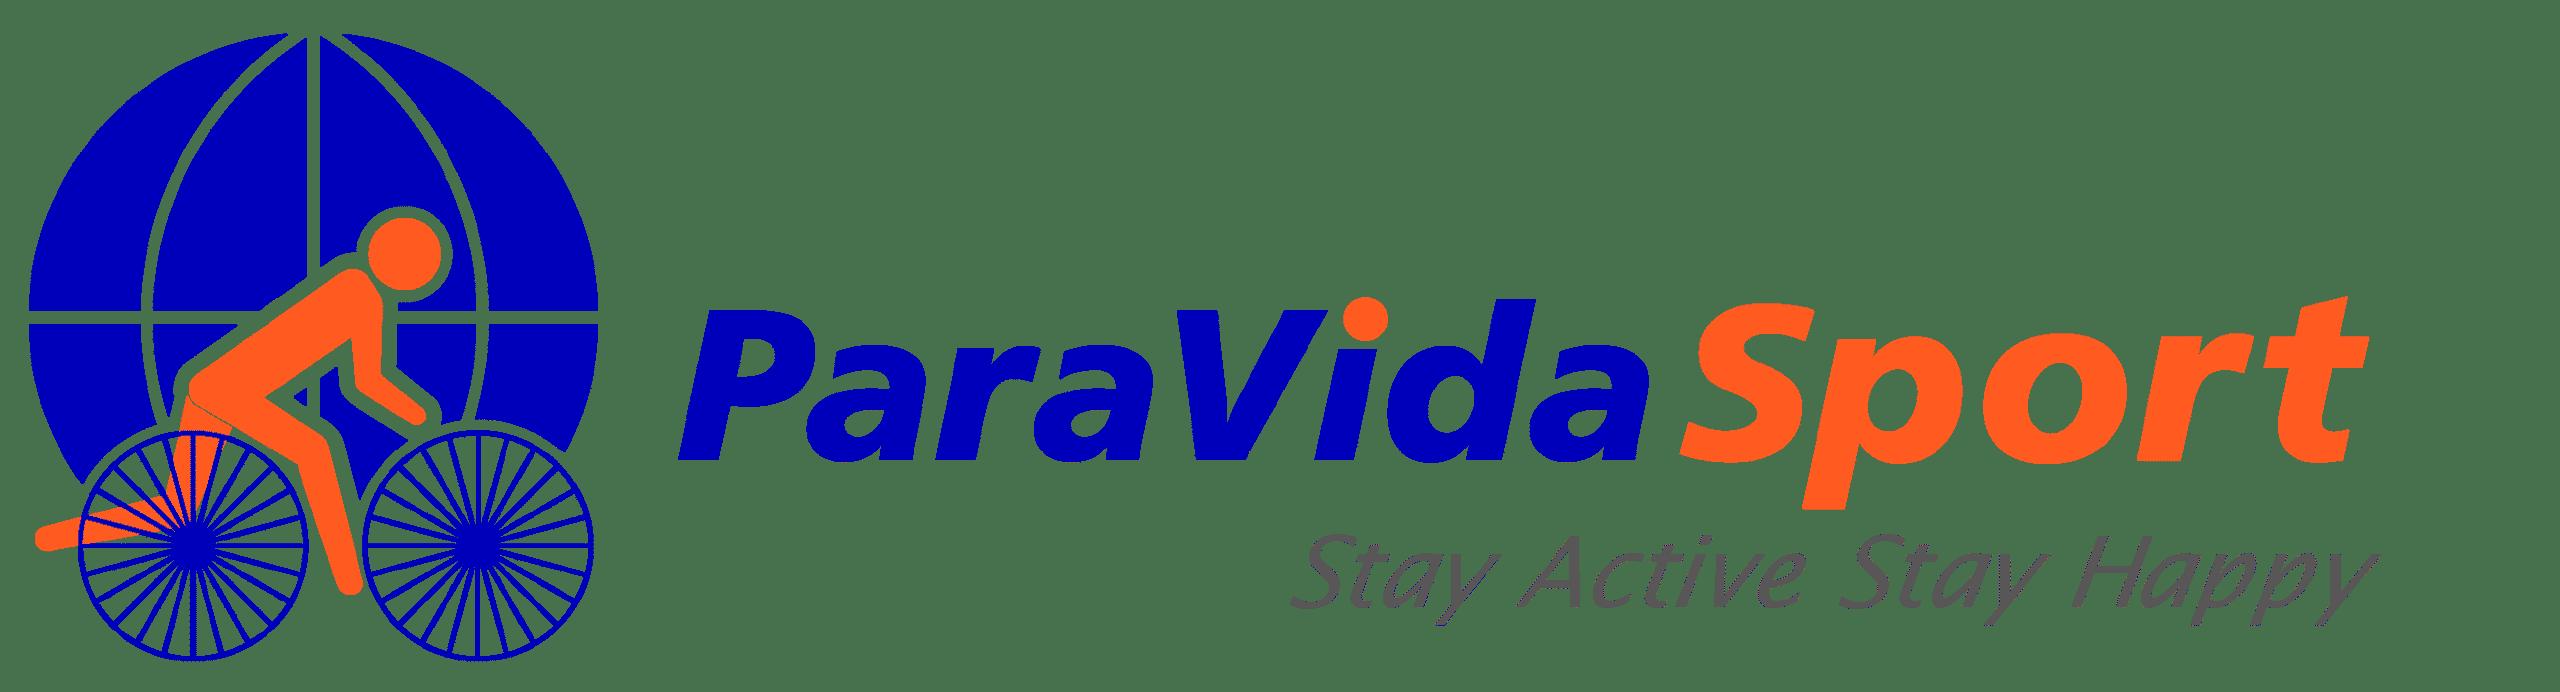 ParaVida Sport